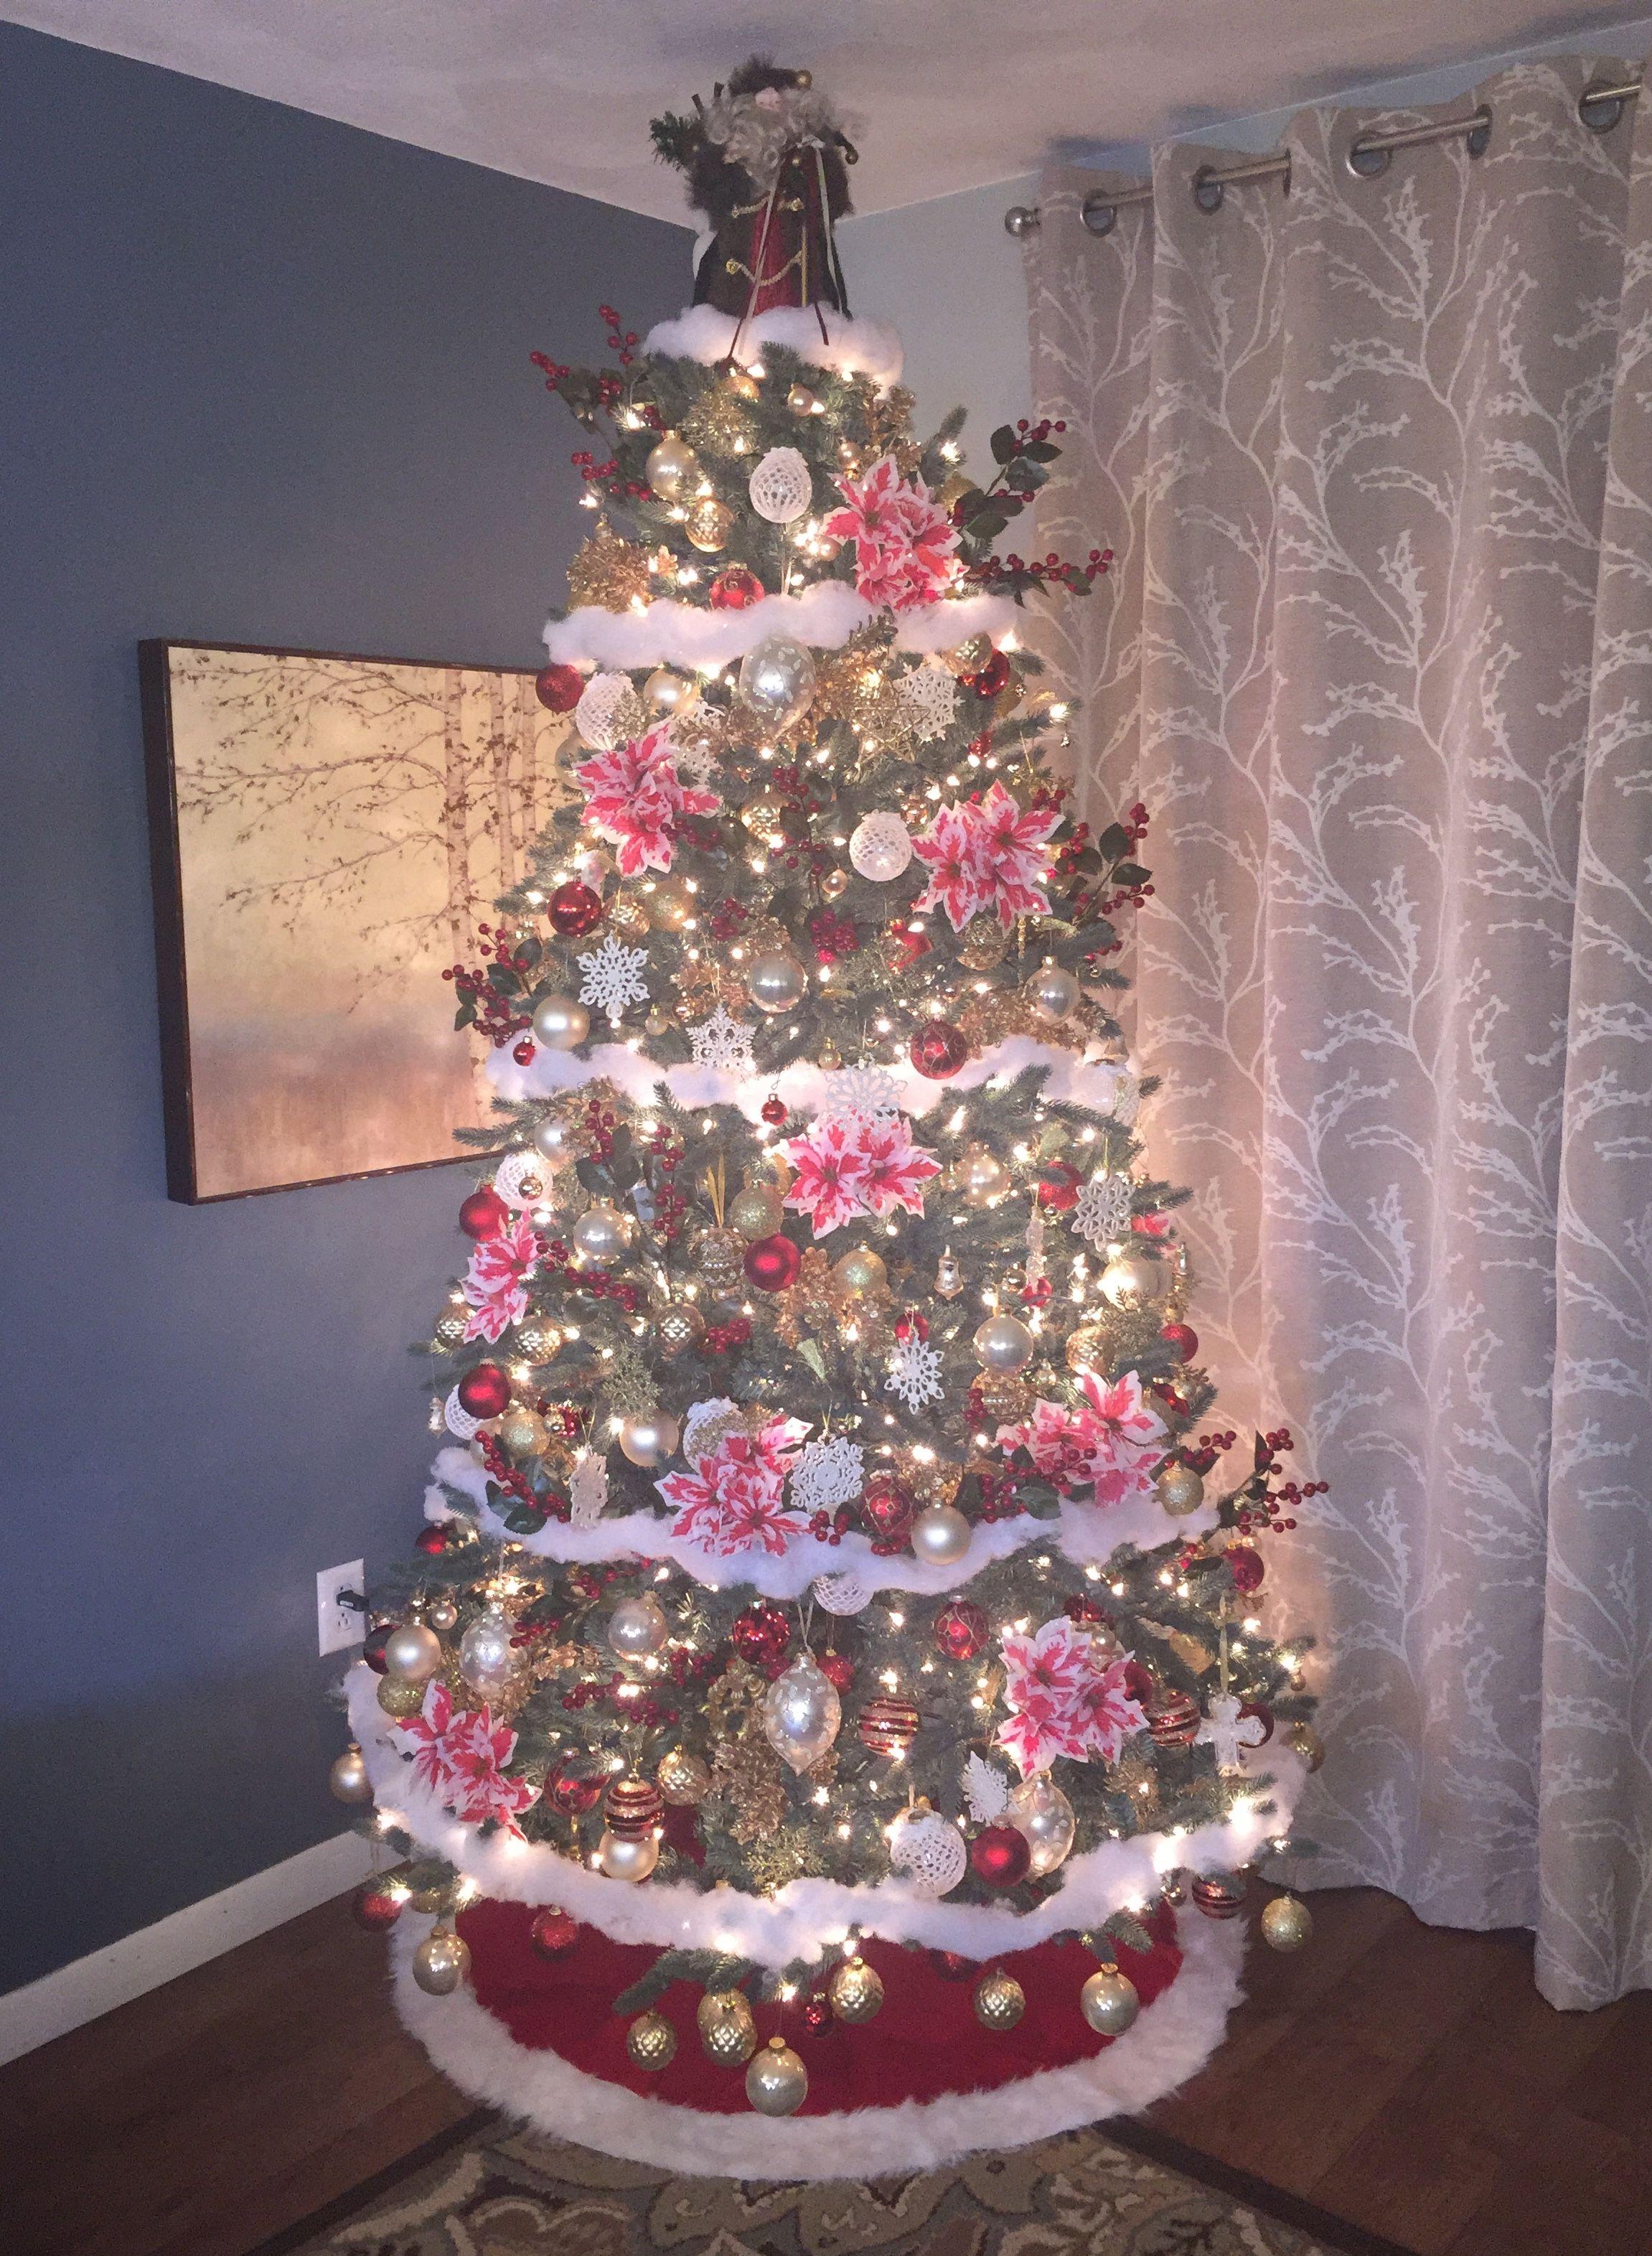 2018 Christmas Tree...red, white, berries and snow.   Christmas, Christmas tree, Holiday